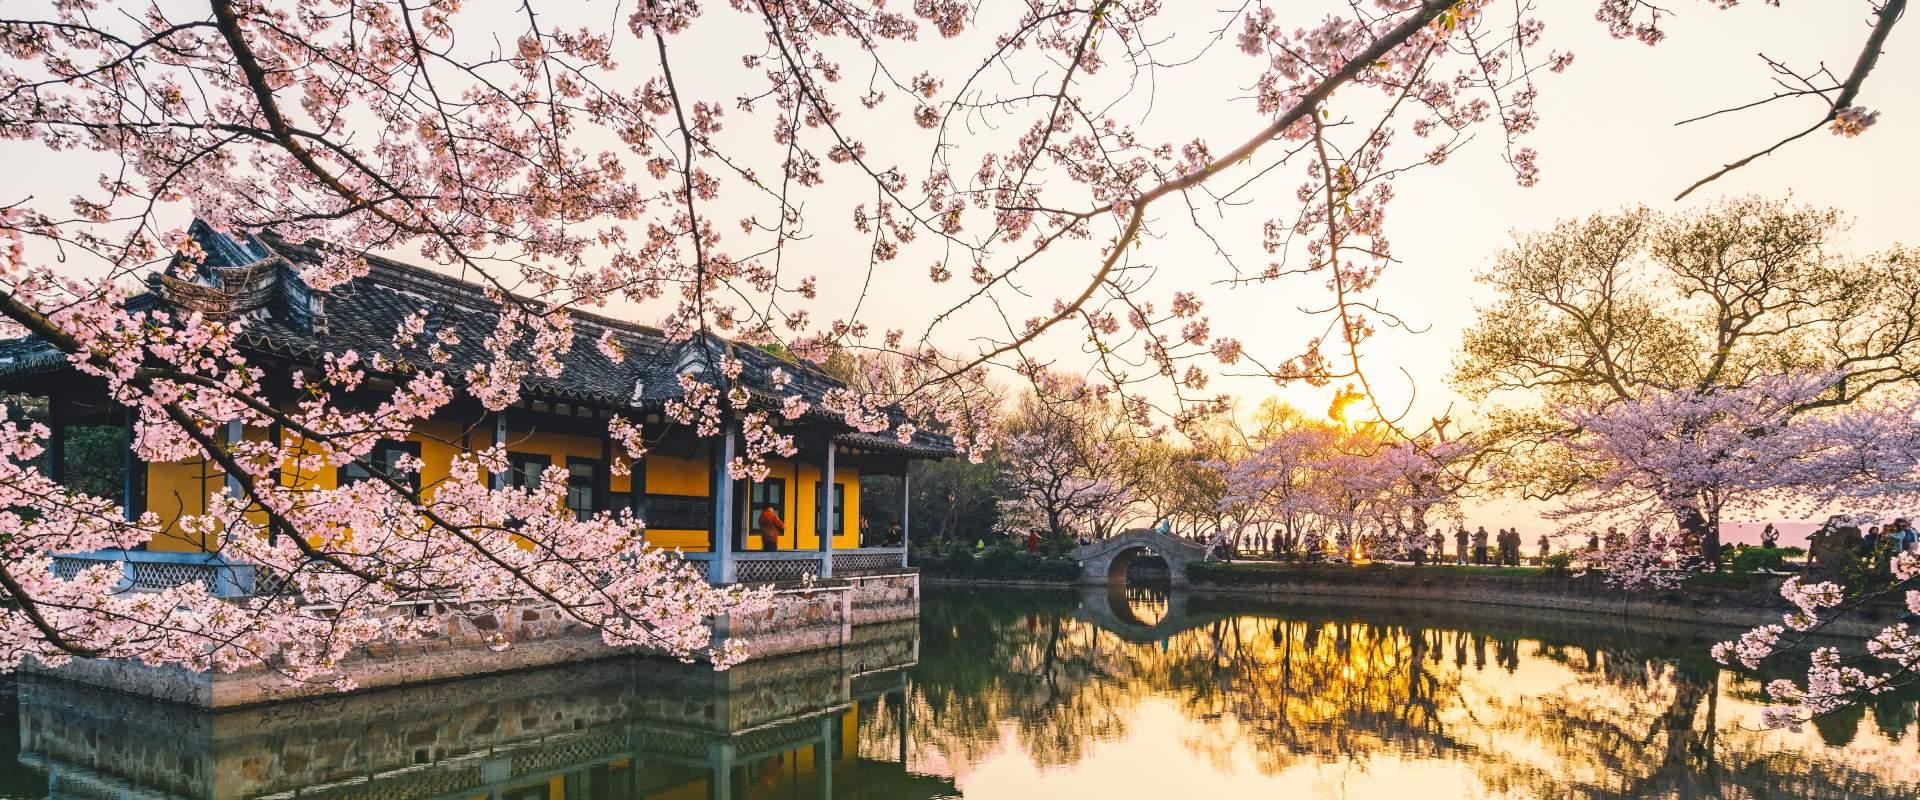 Cherry blossom overhang, Turtle Isle Japan